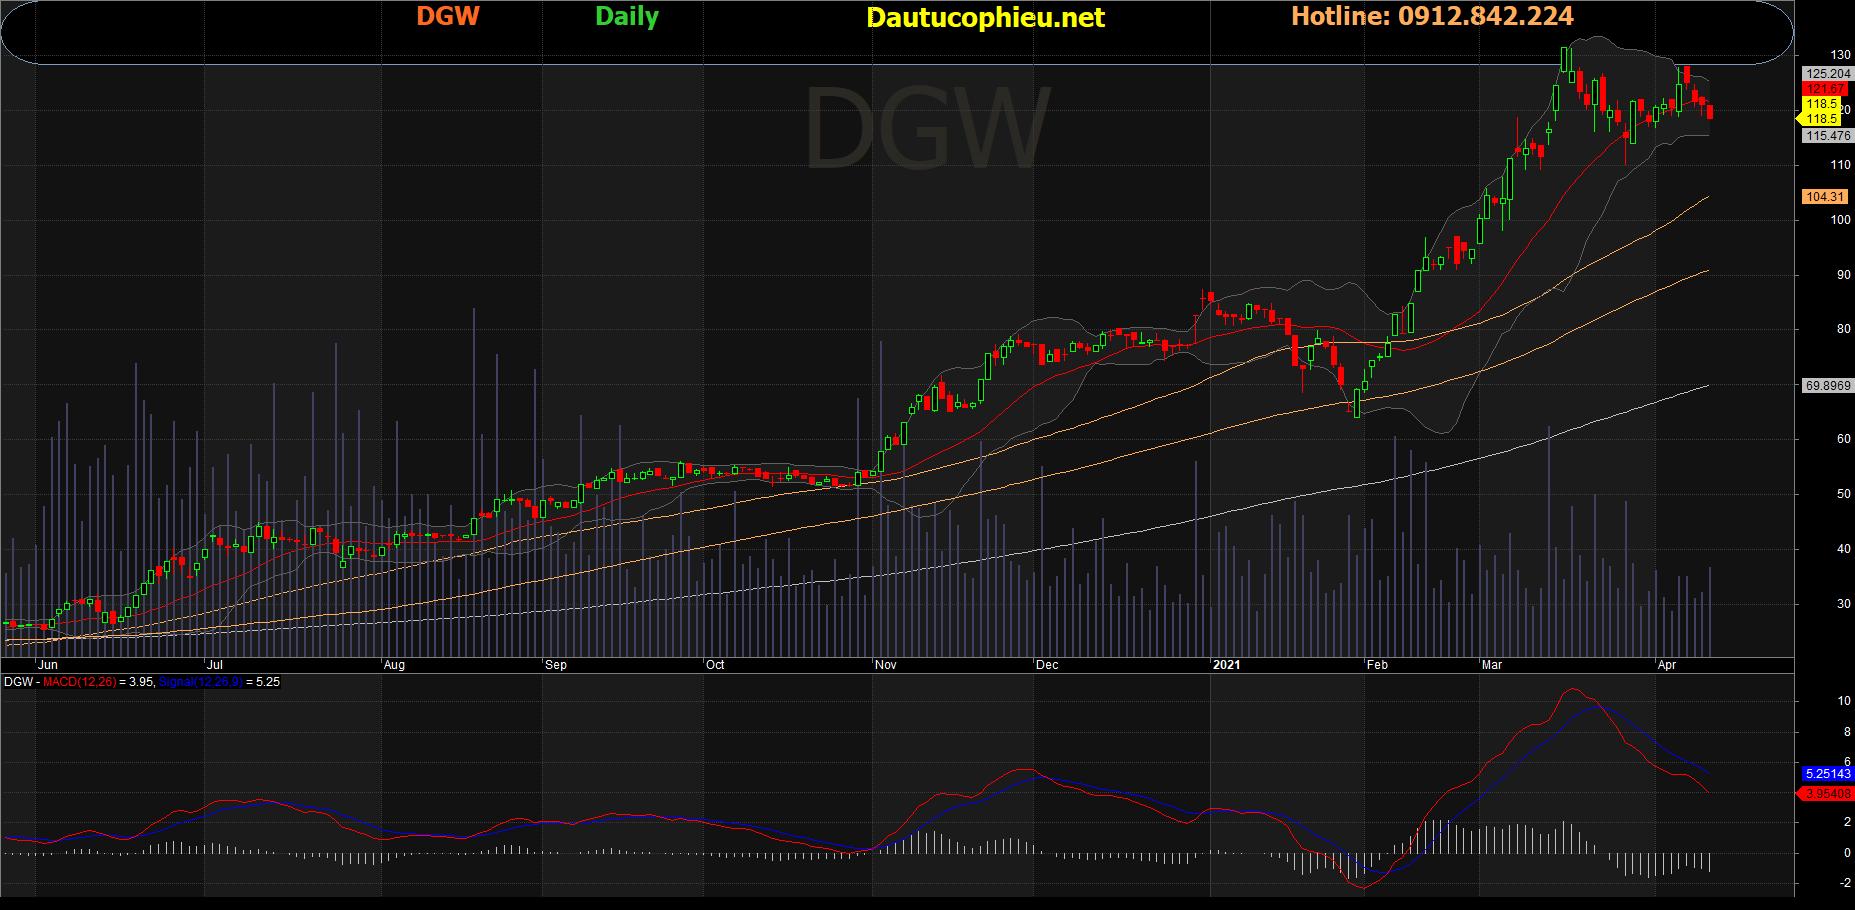 Cổ phiếu DGW